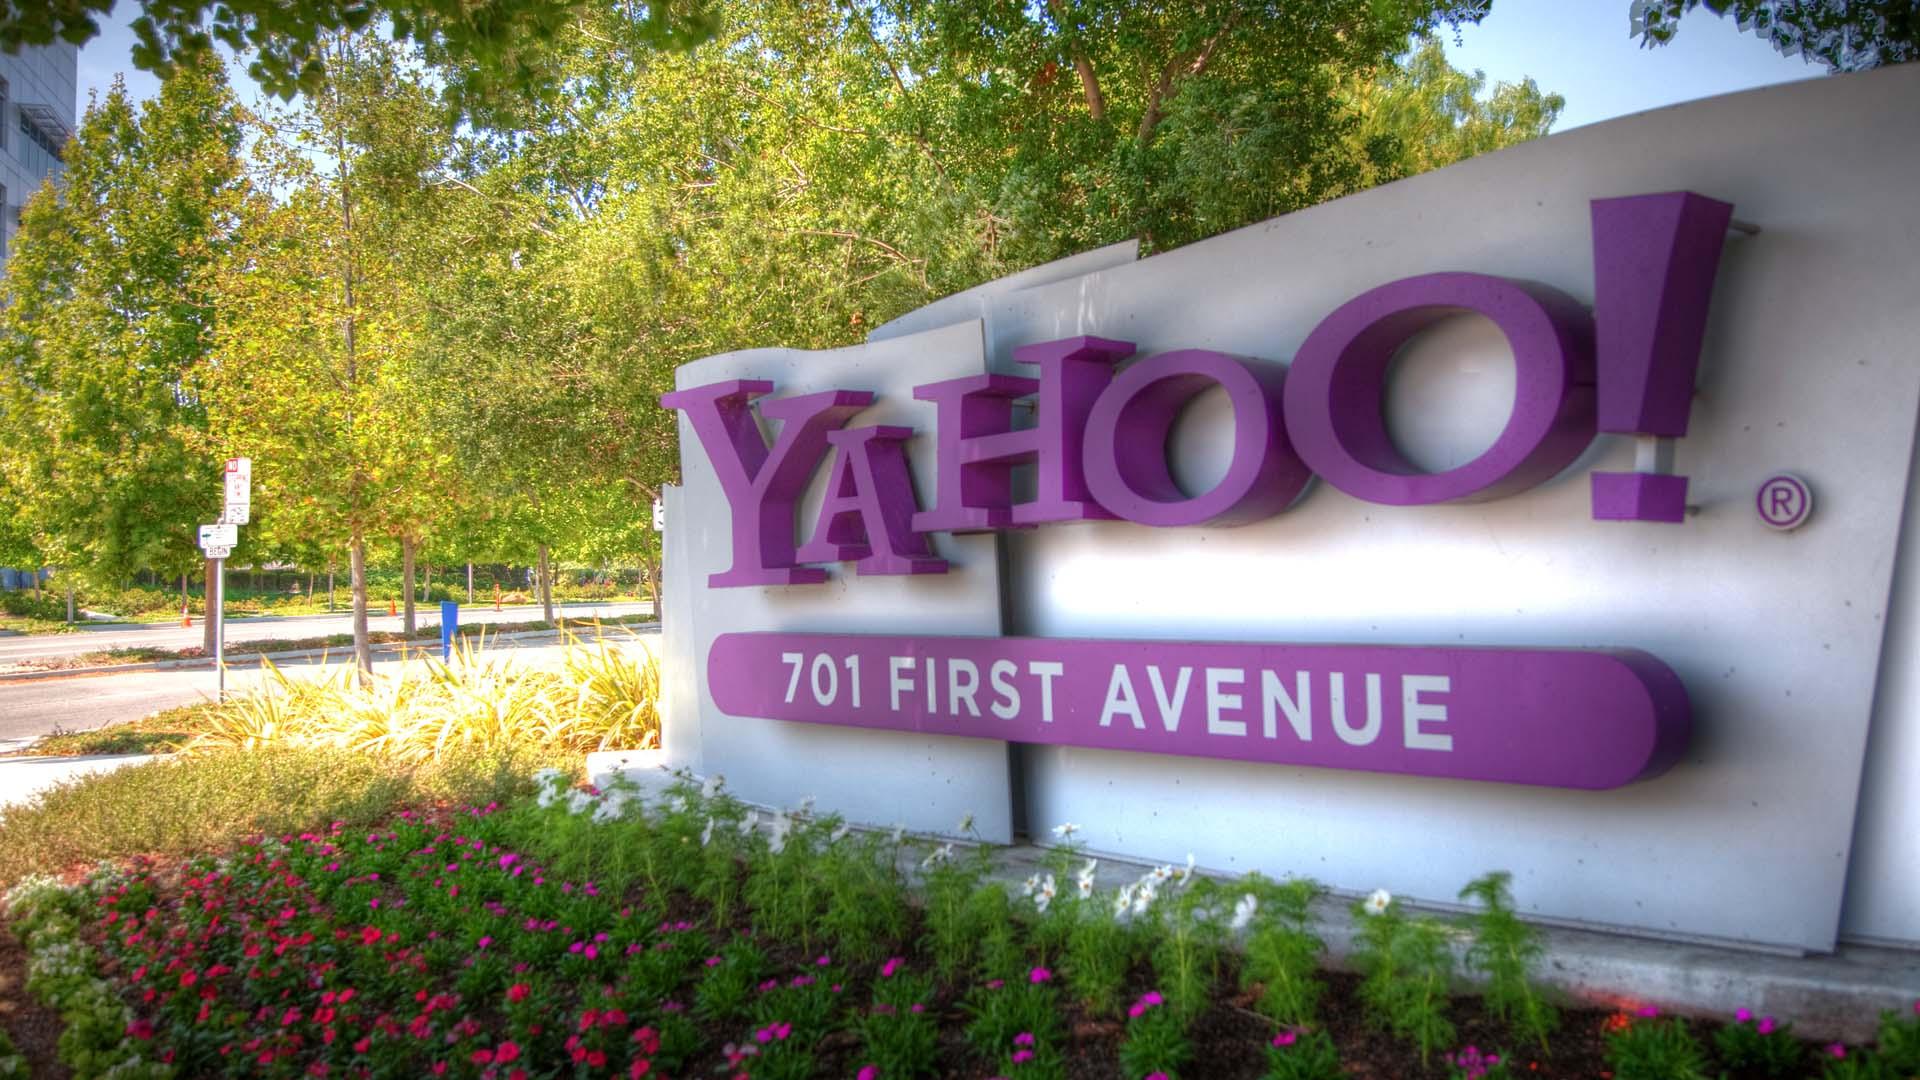 Verizon voudrait un rabais de 1 milliard de dollars — Rachat de Yahoo!